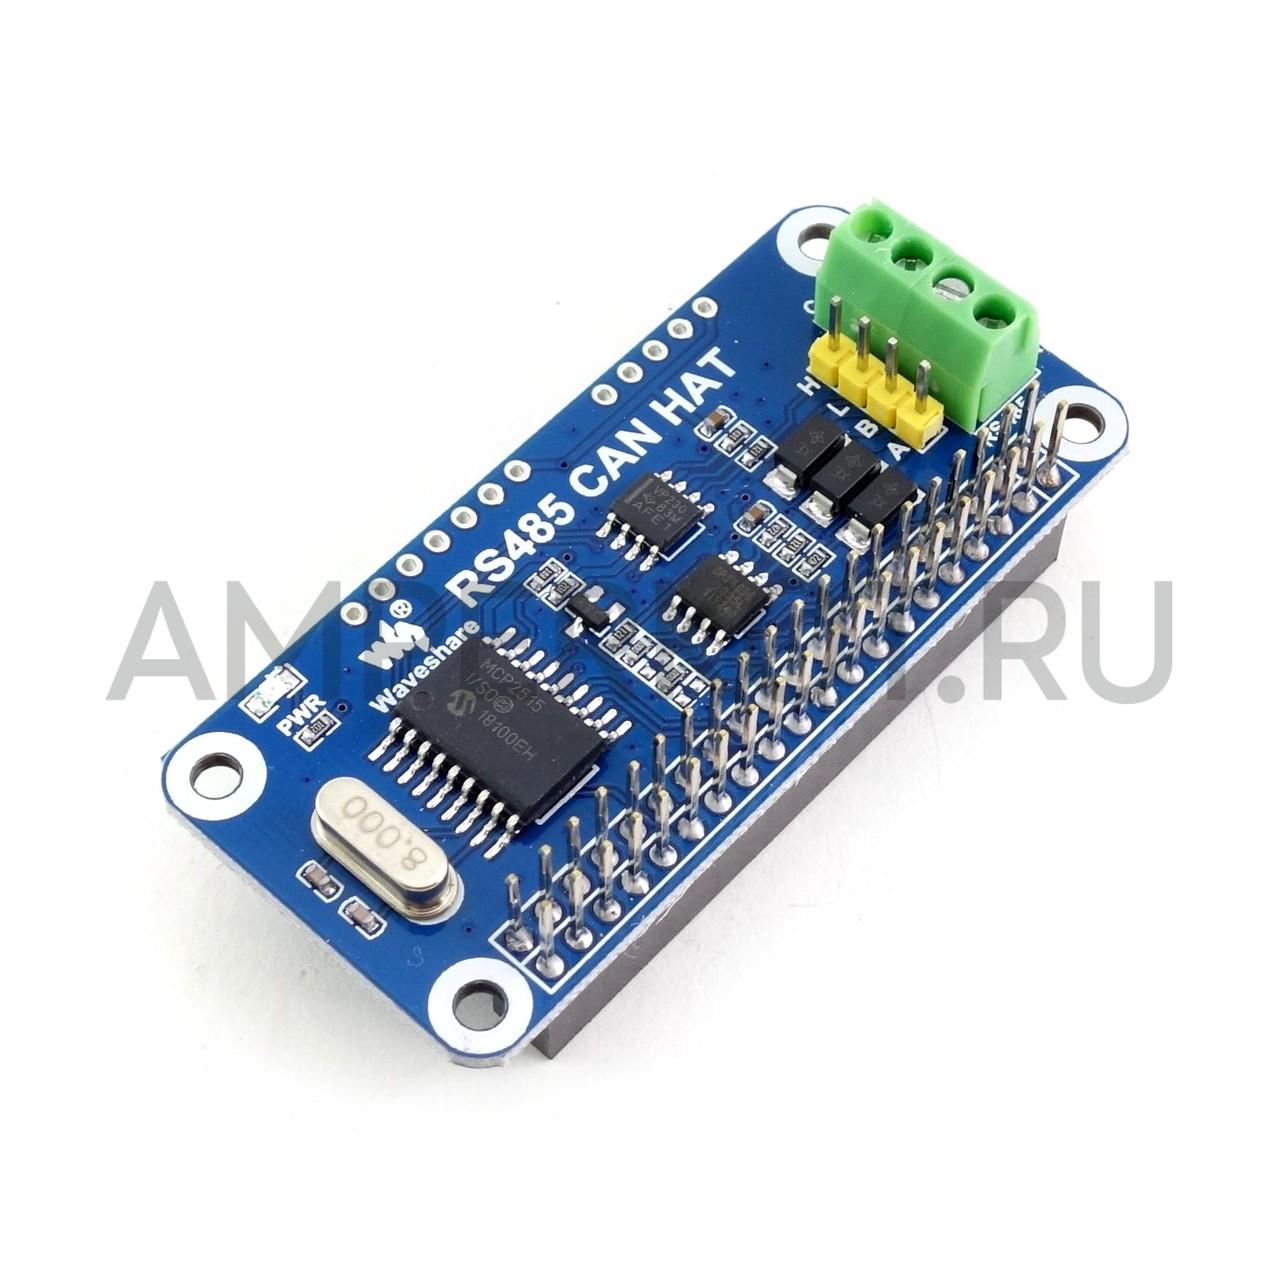 Купить Raspberry Pi CAN RS485 UART шилд